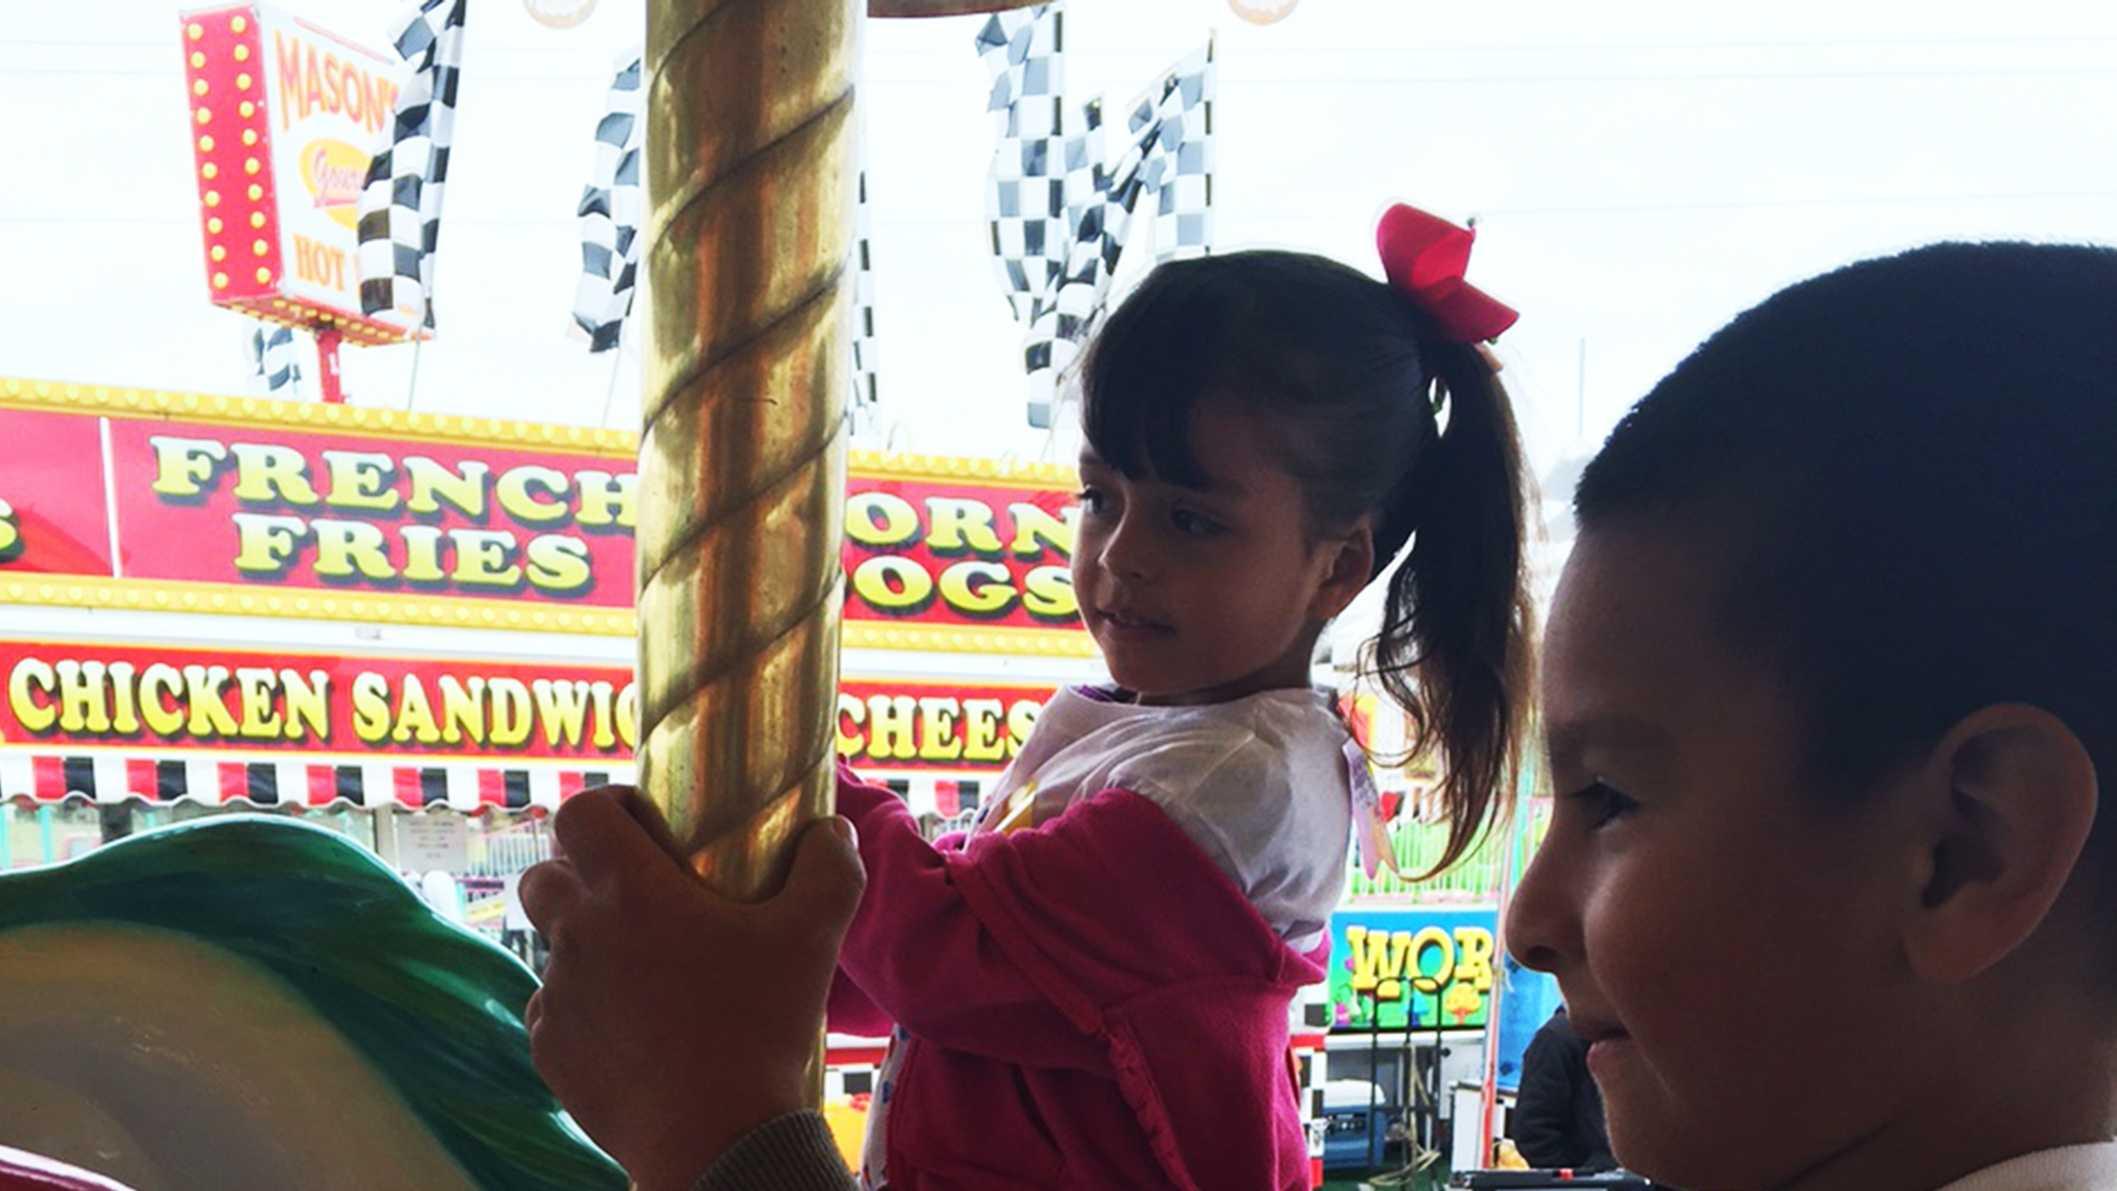 Salinas (July 14, 2015)